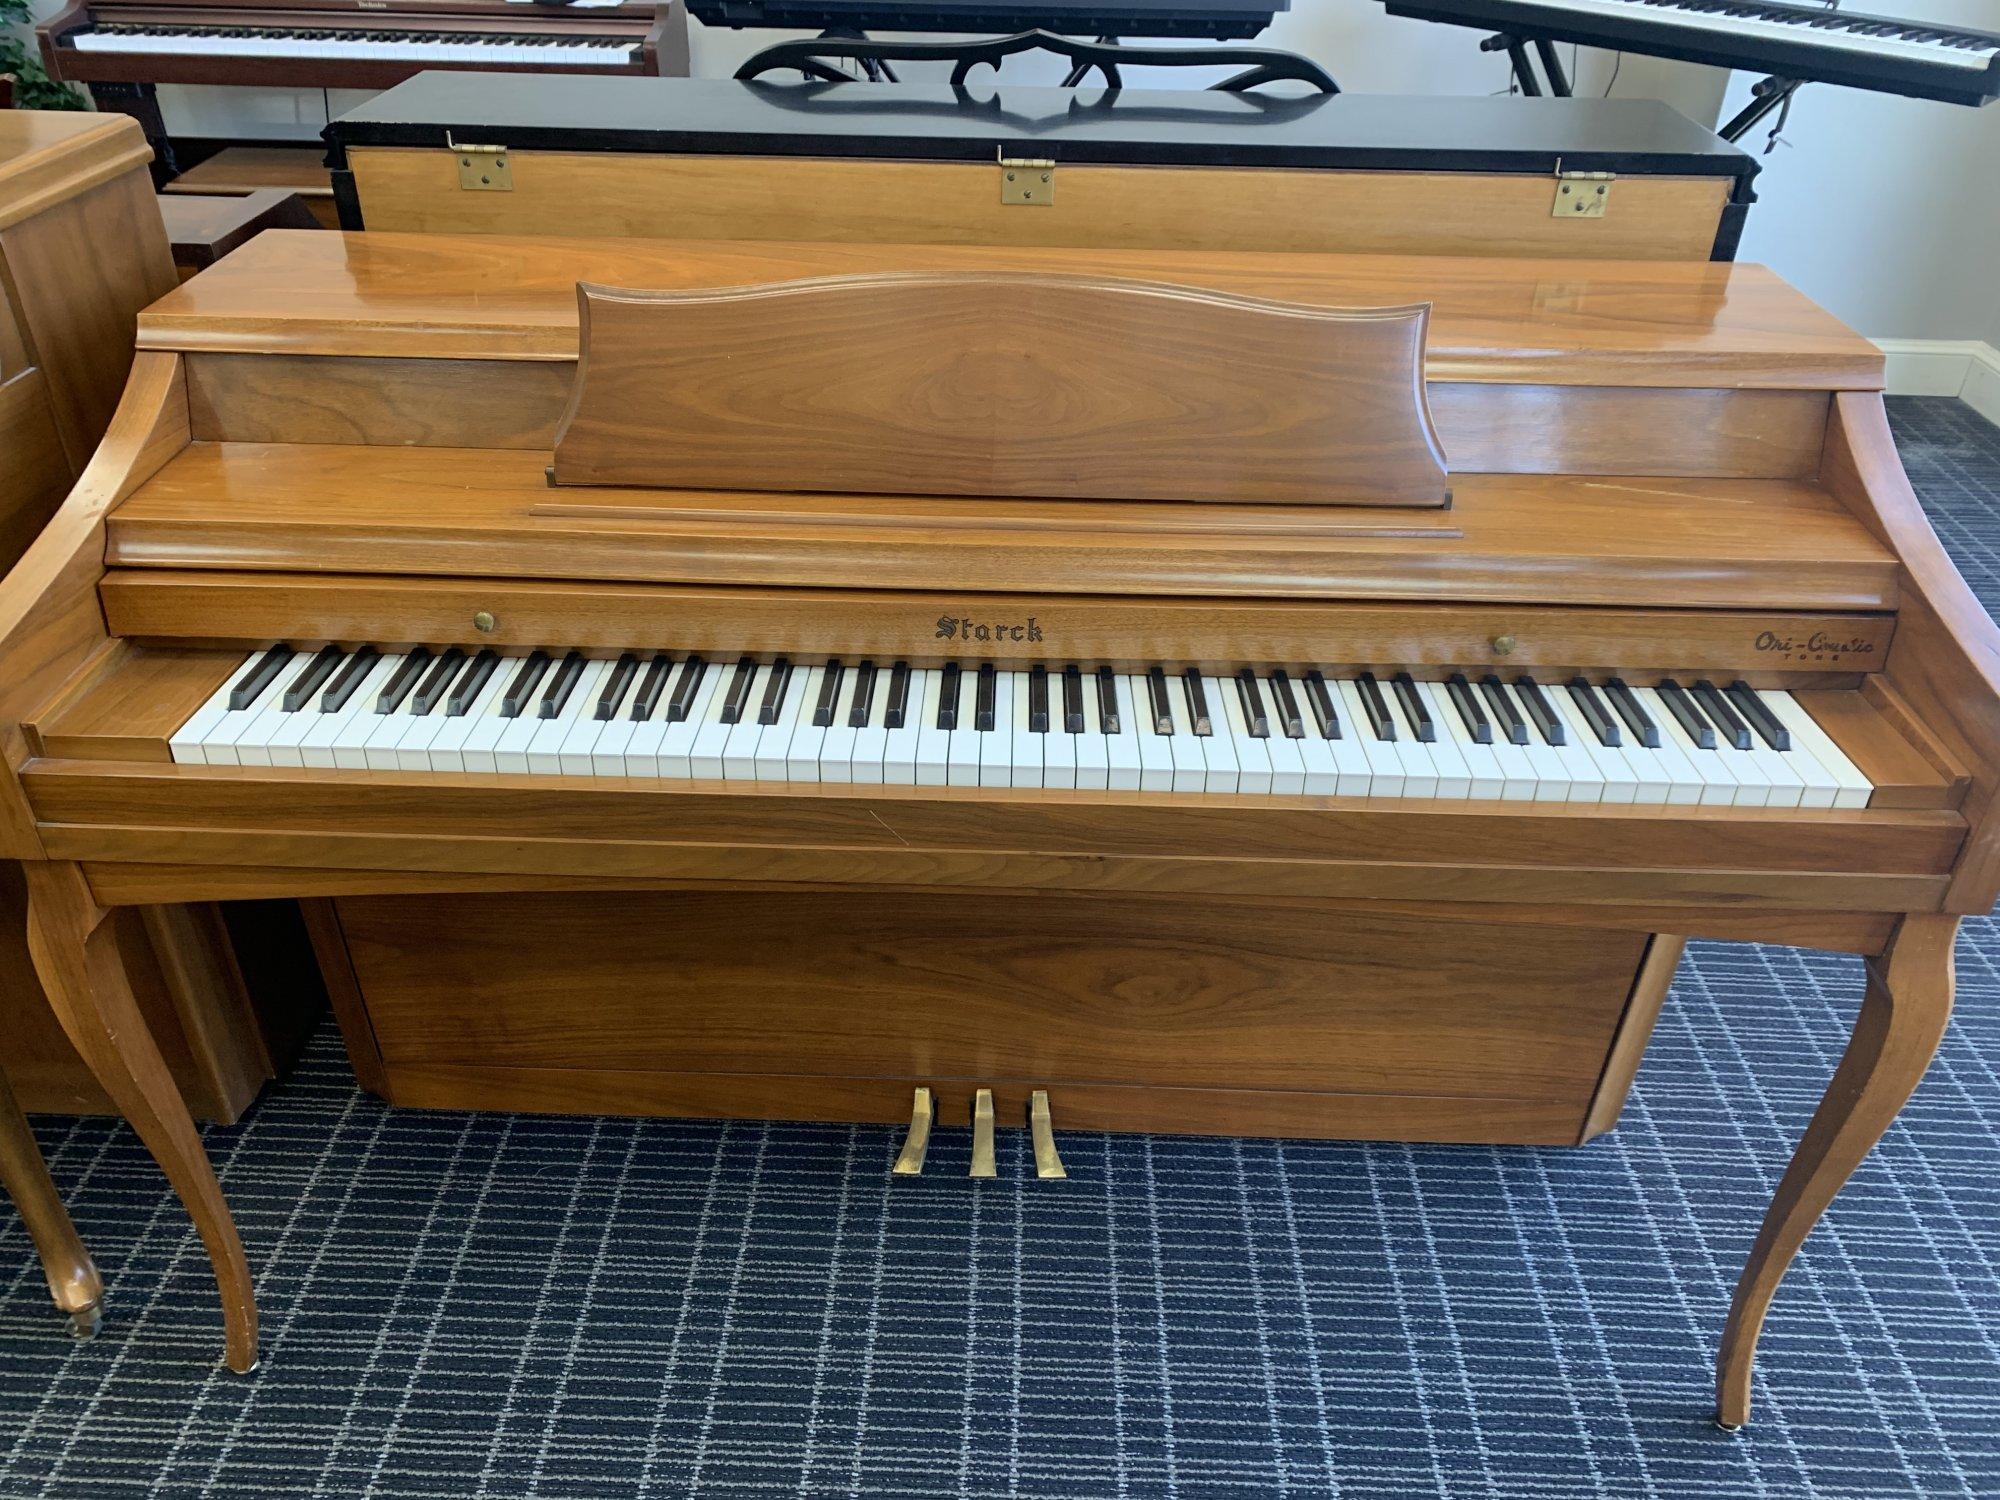 Starck Spinet Piano